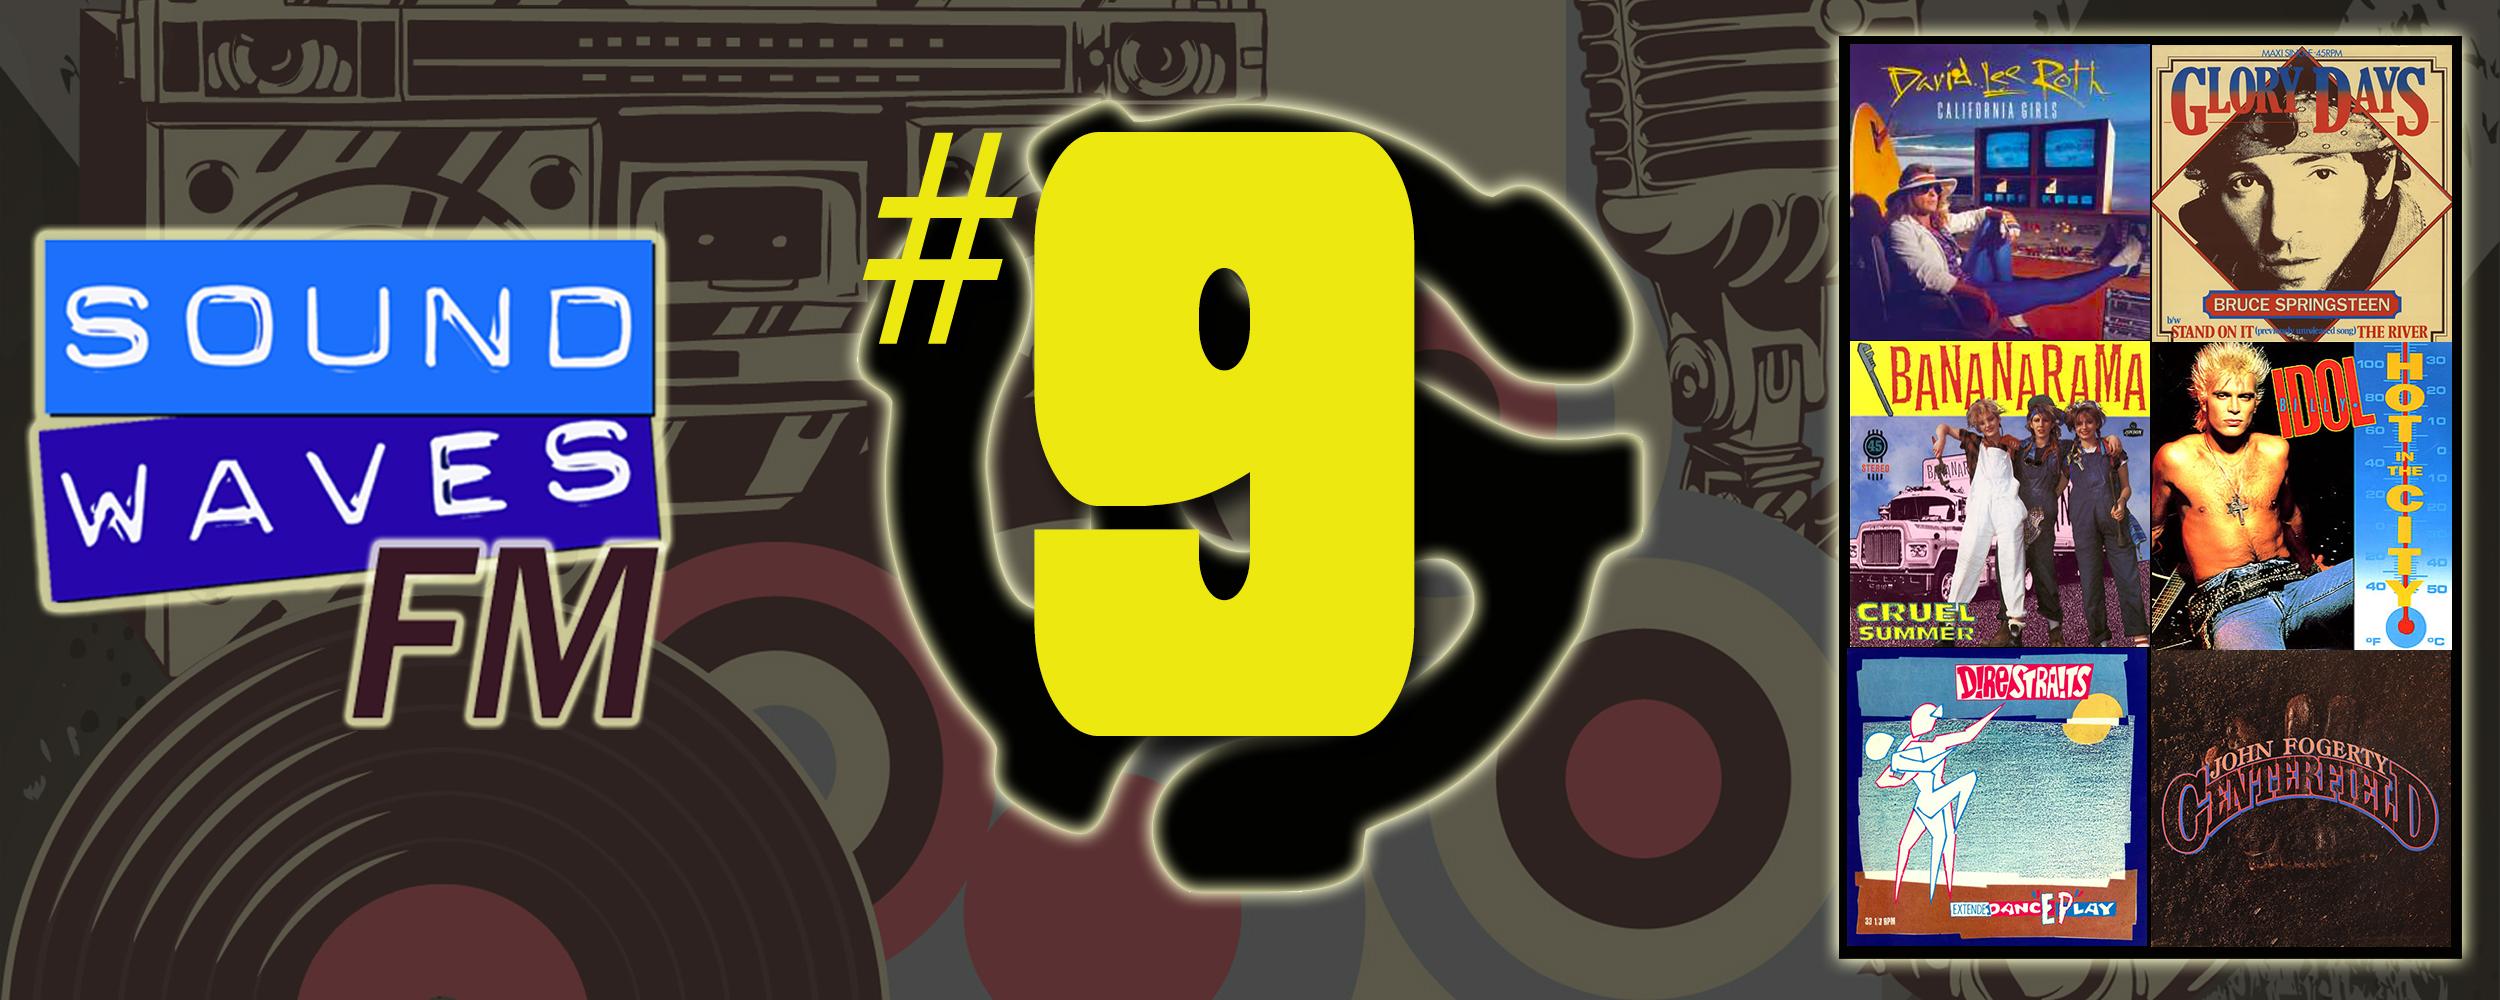 Soundwaves FM: Episode 9 – Summertime Blues